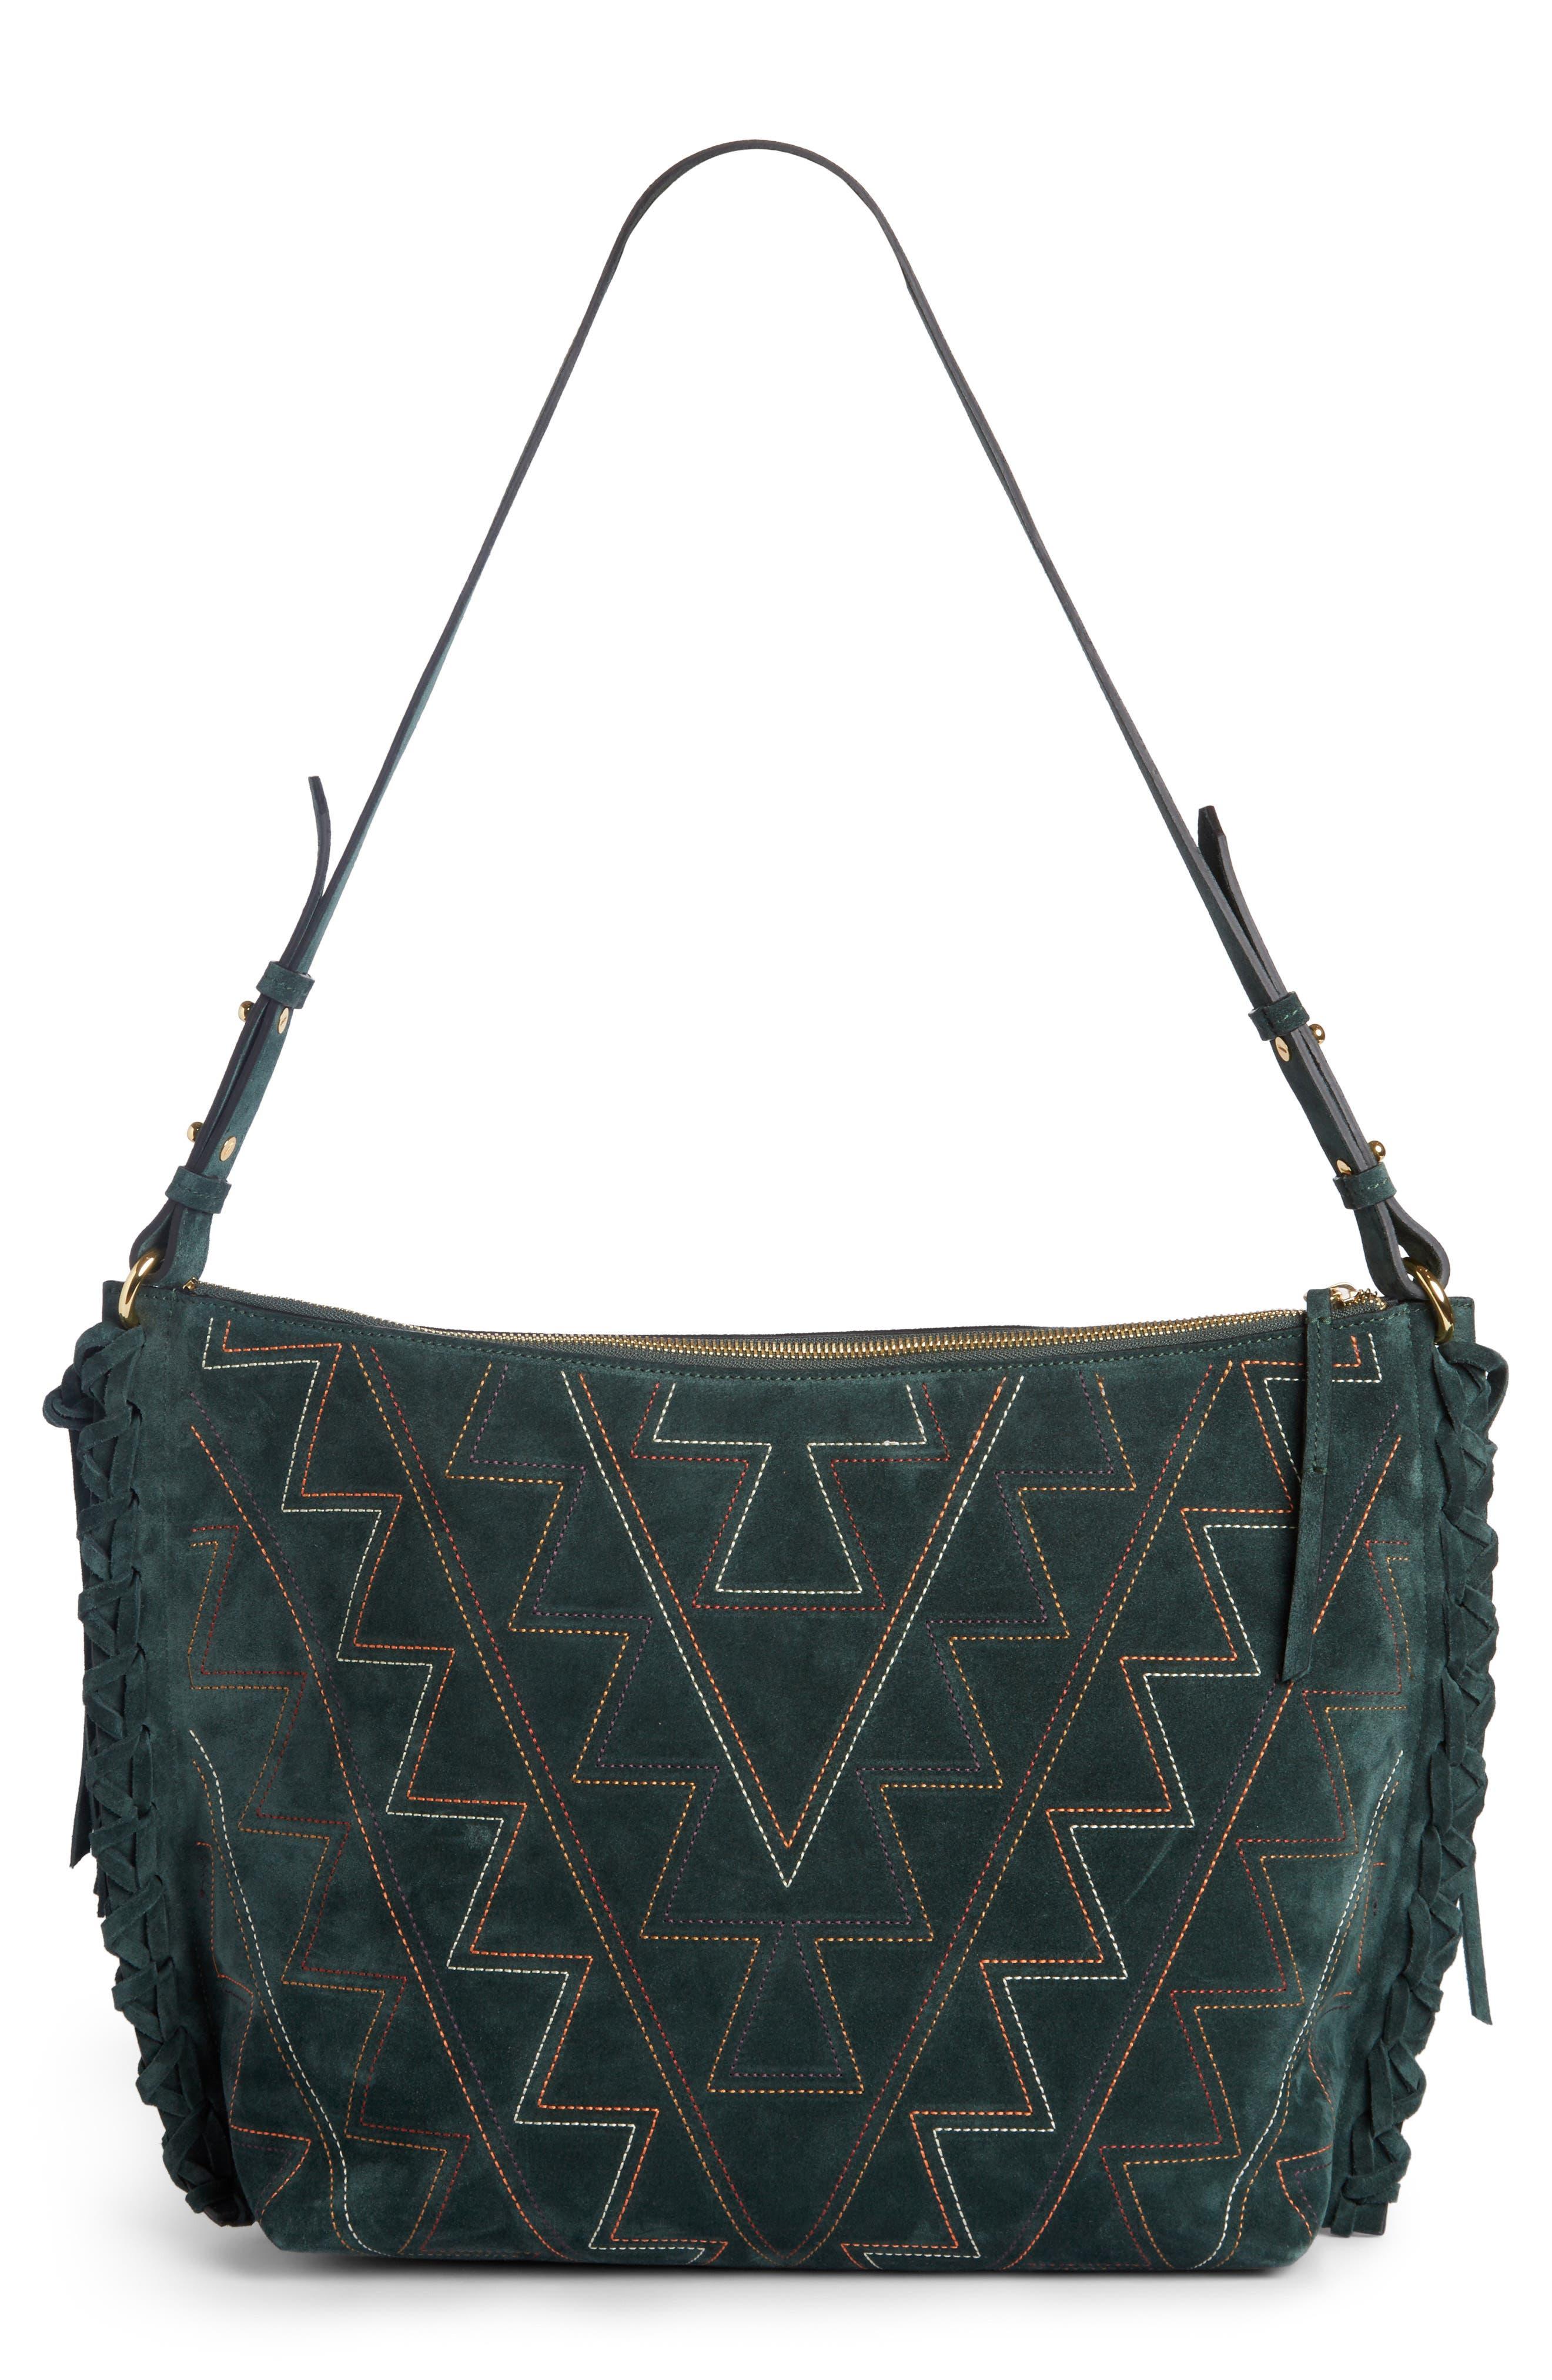 Osun Stitched Suede Shoulder Bag,                             Main thumbnail 1, color,                             301